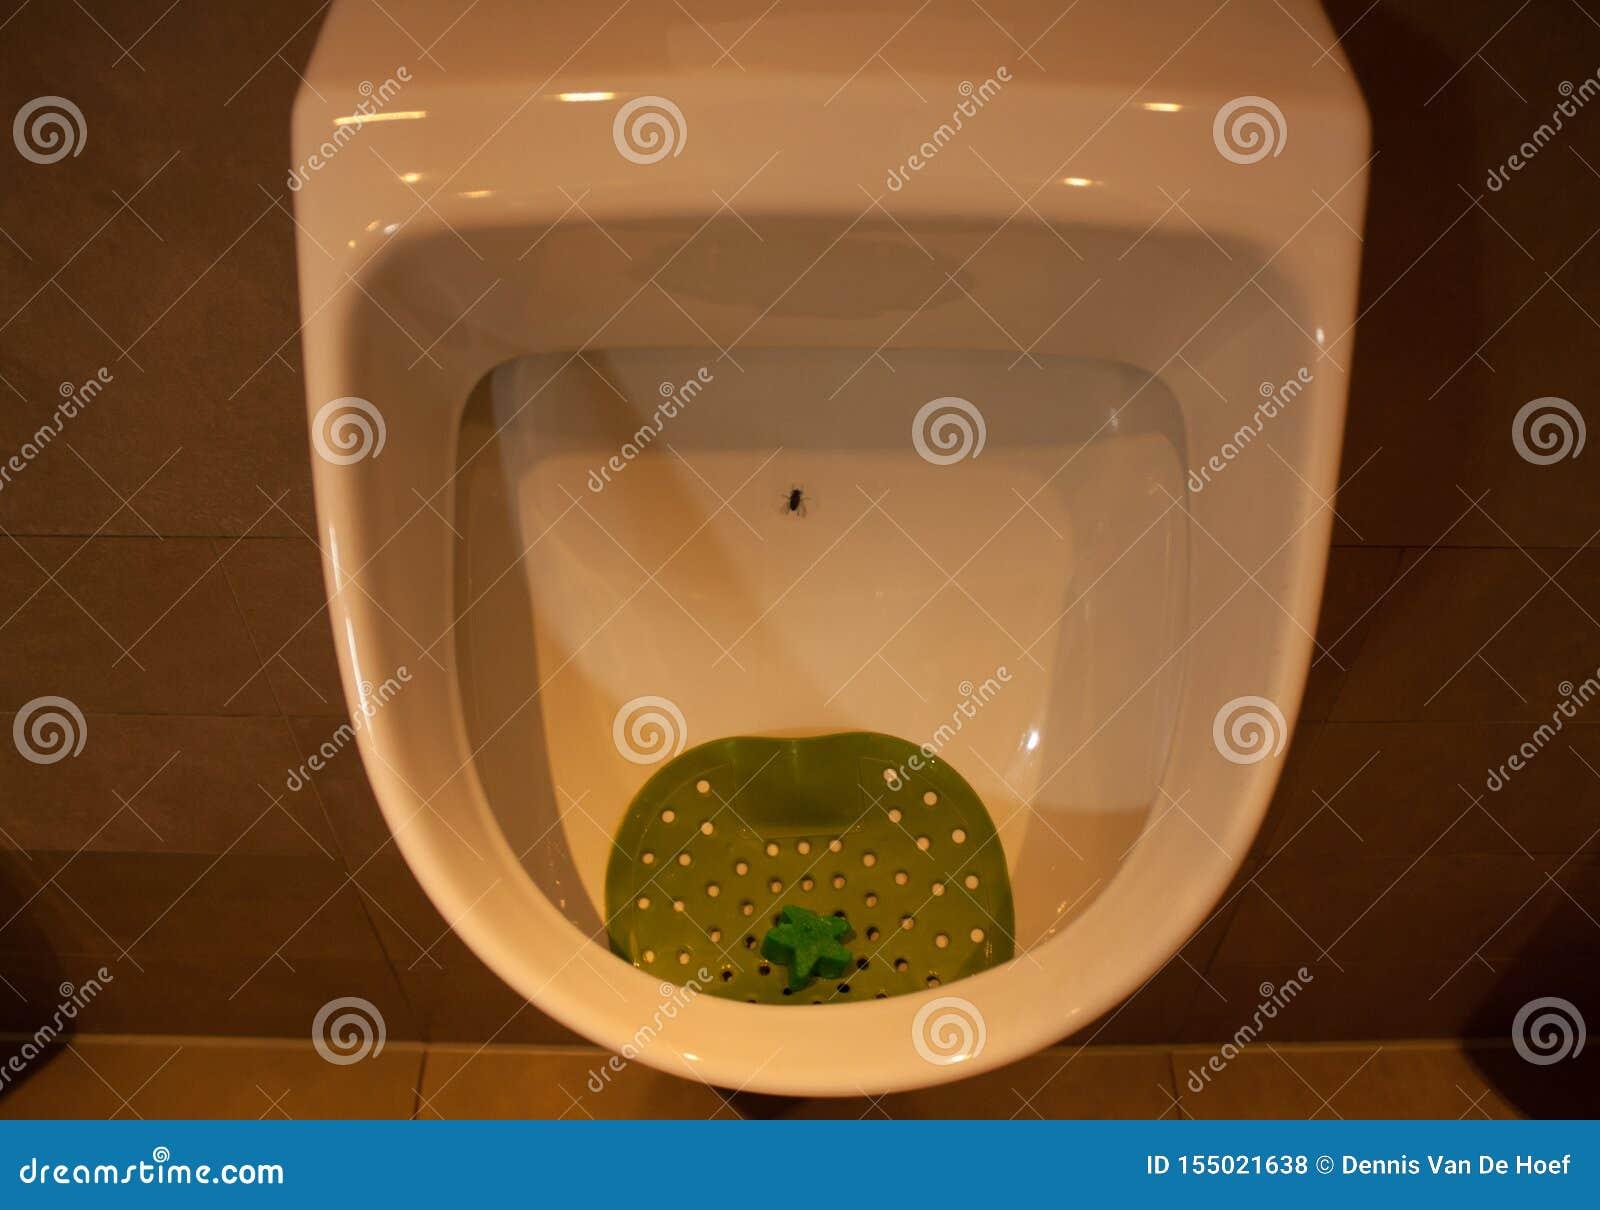 An urinoir/urinal in a public toilet.